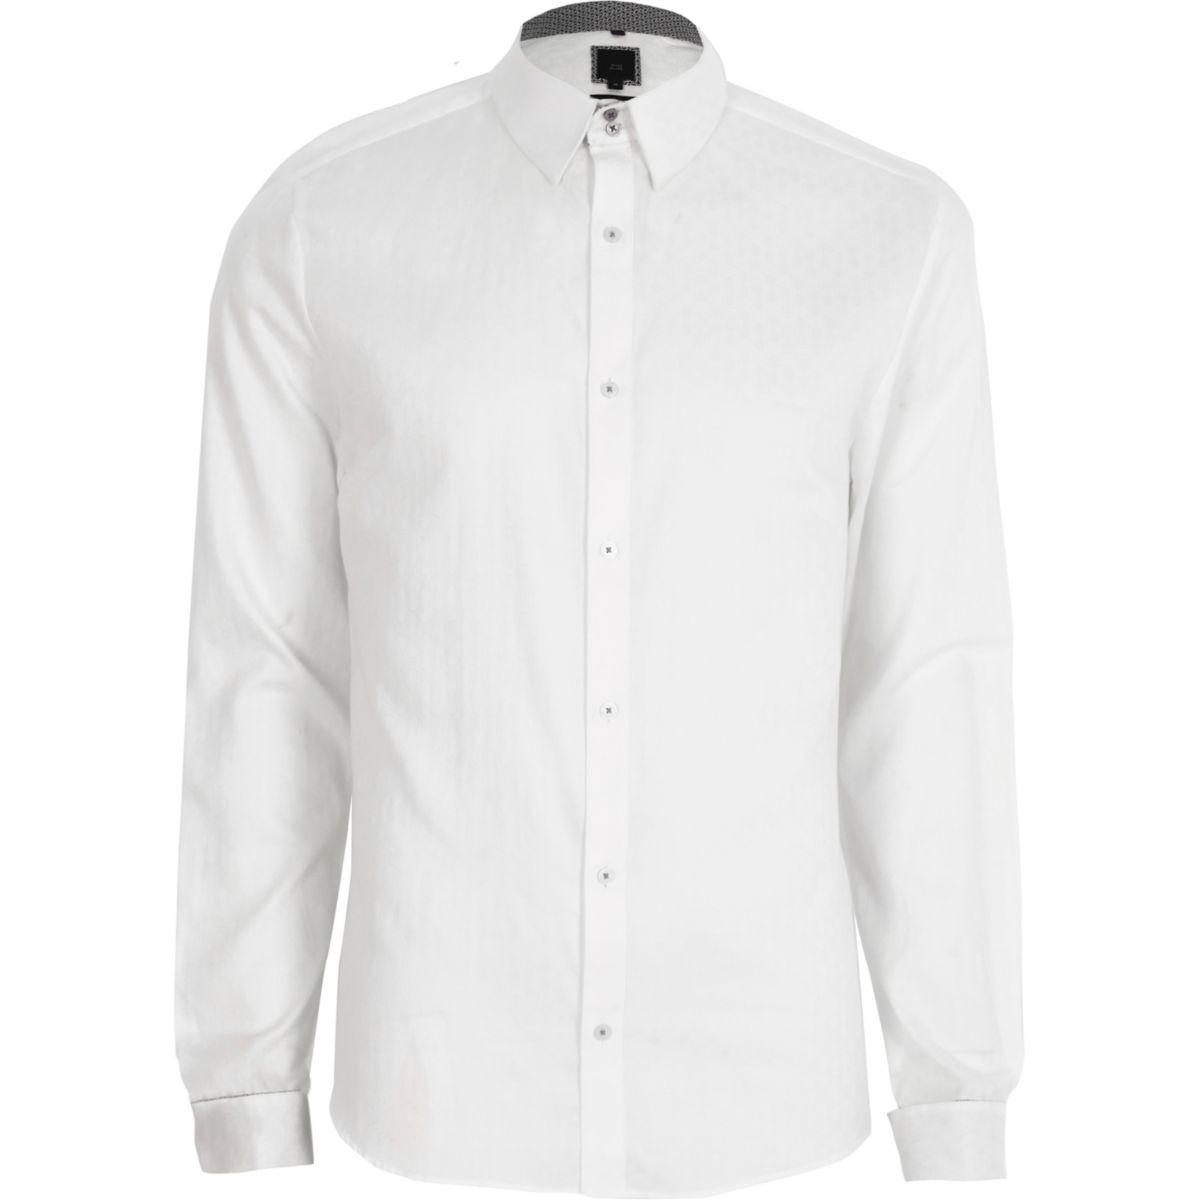 White jacquard slim fit long sleeve shirt